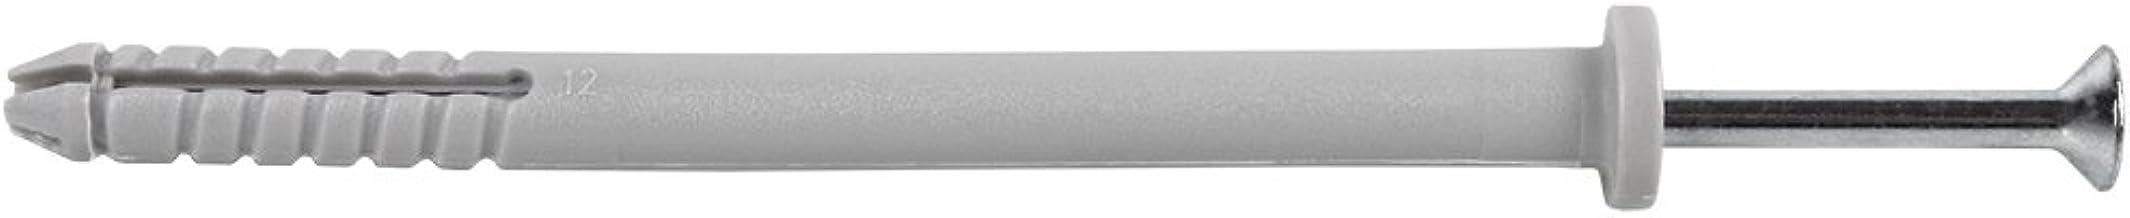 COFAN 07710680 – pak van 100 pluggen slag halsroos plat 6 x 80 mm)